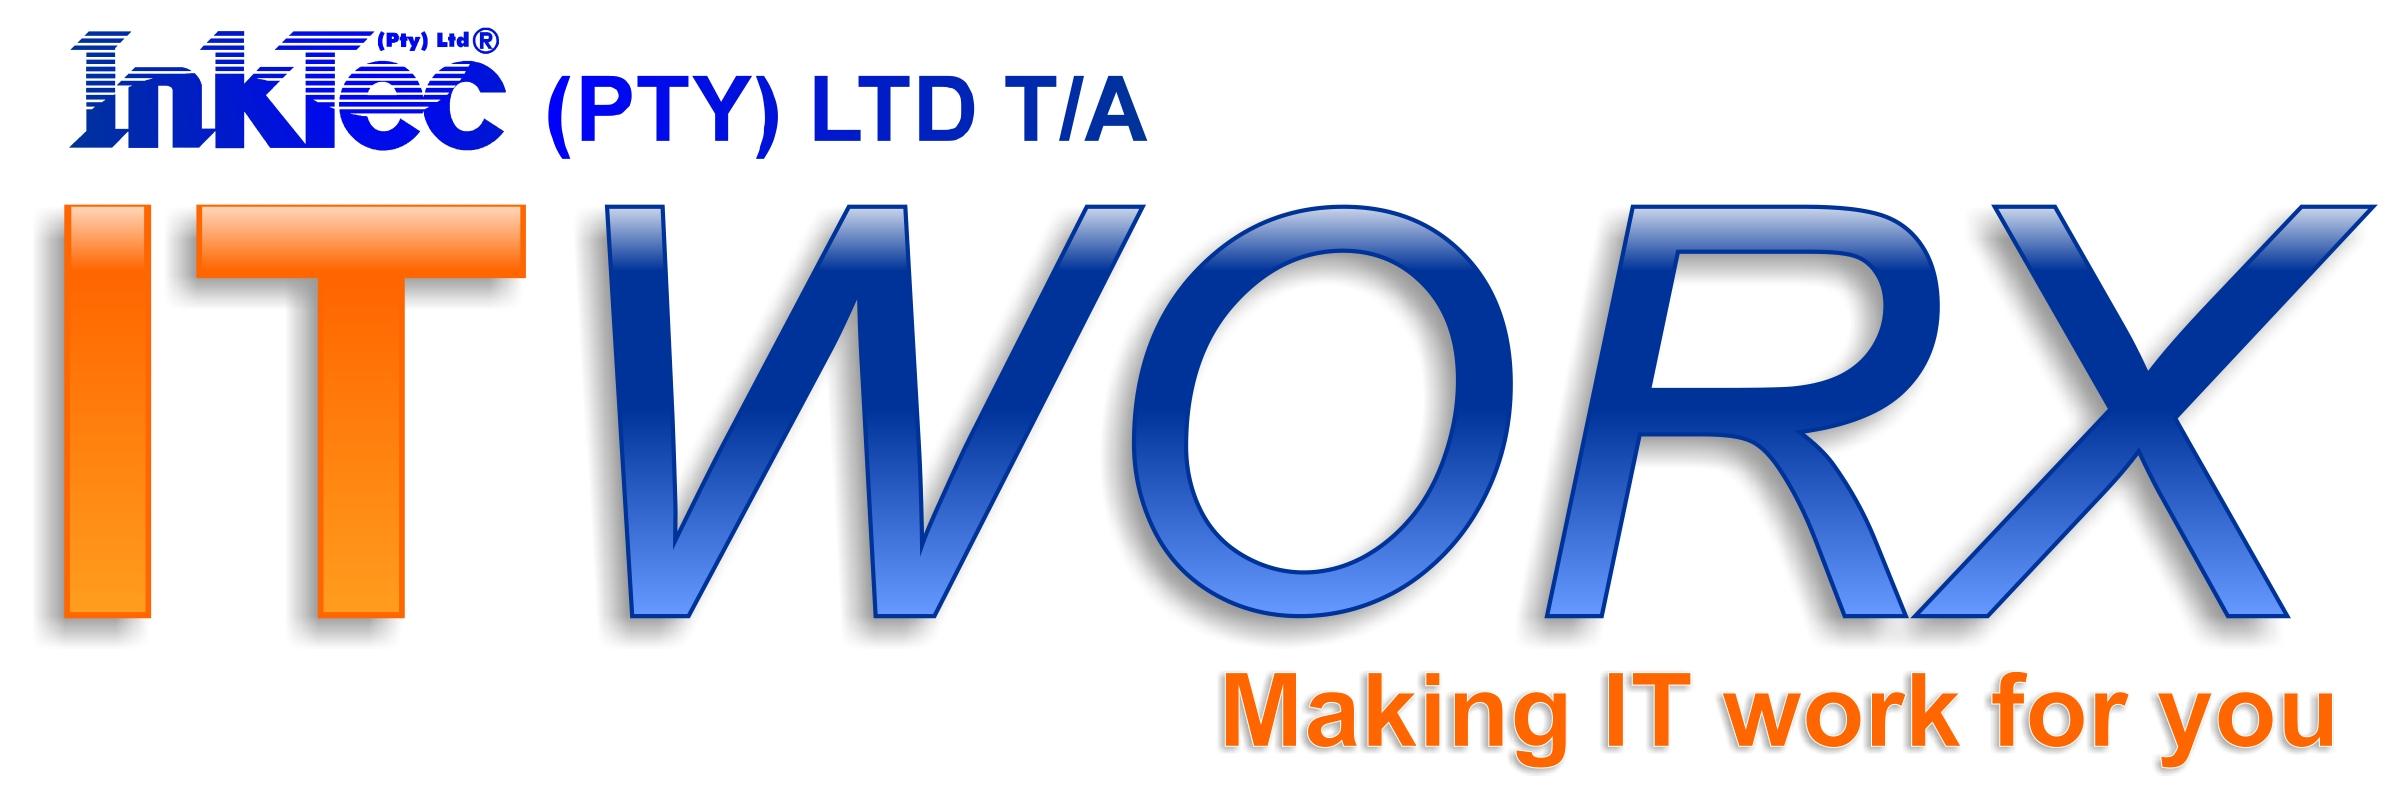 Contact Us Petroleum Coke Company Pty Ltd Mail: Inktec (Pty) Ltd T/a ITWORX On M2North